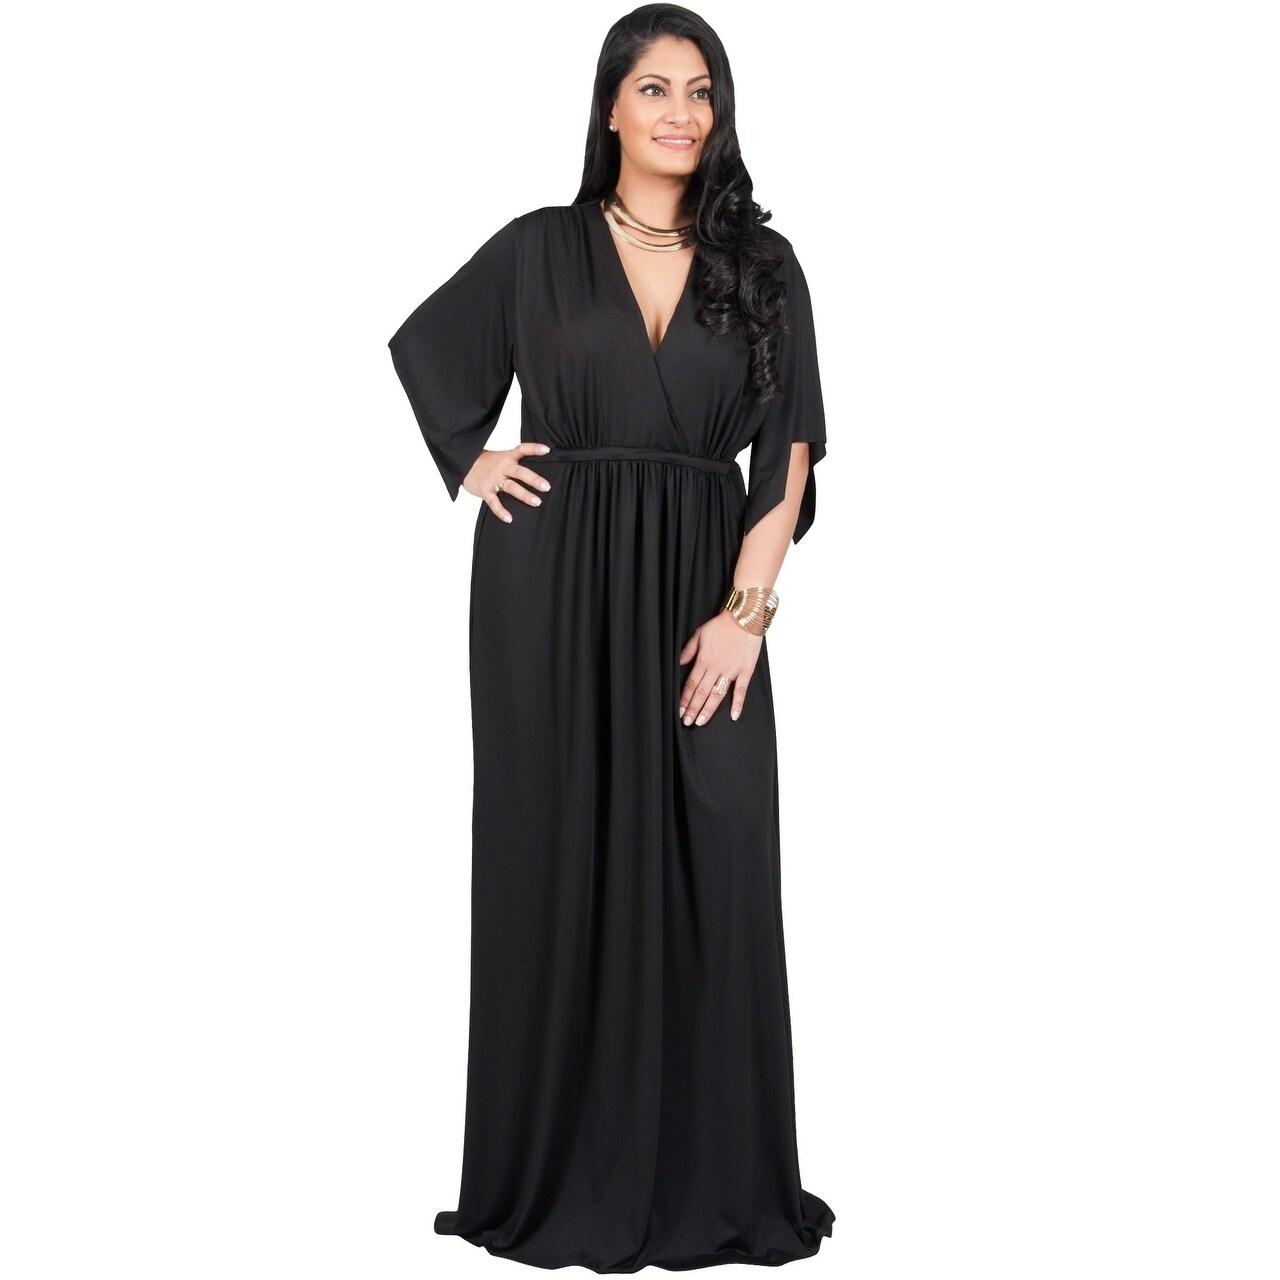 d083912d8c37 Shop Adelyn & Vivian Women's Plus-size Short Split-sleeve Empire-waist  V-neck Long Maxi Dress - Free Shipping Today - Overstock - 12873003